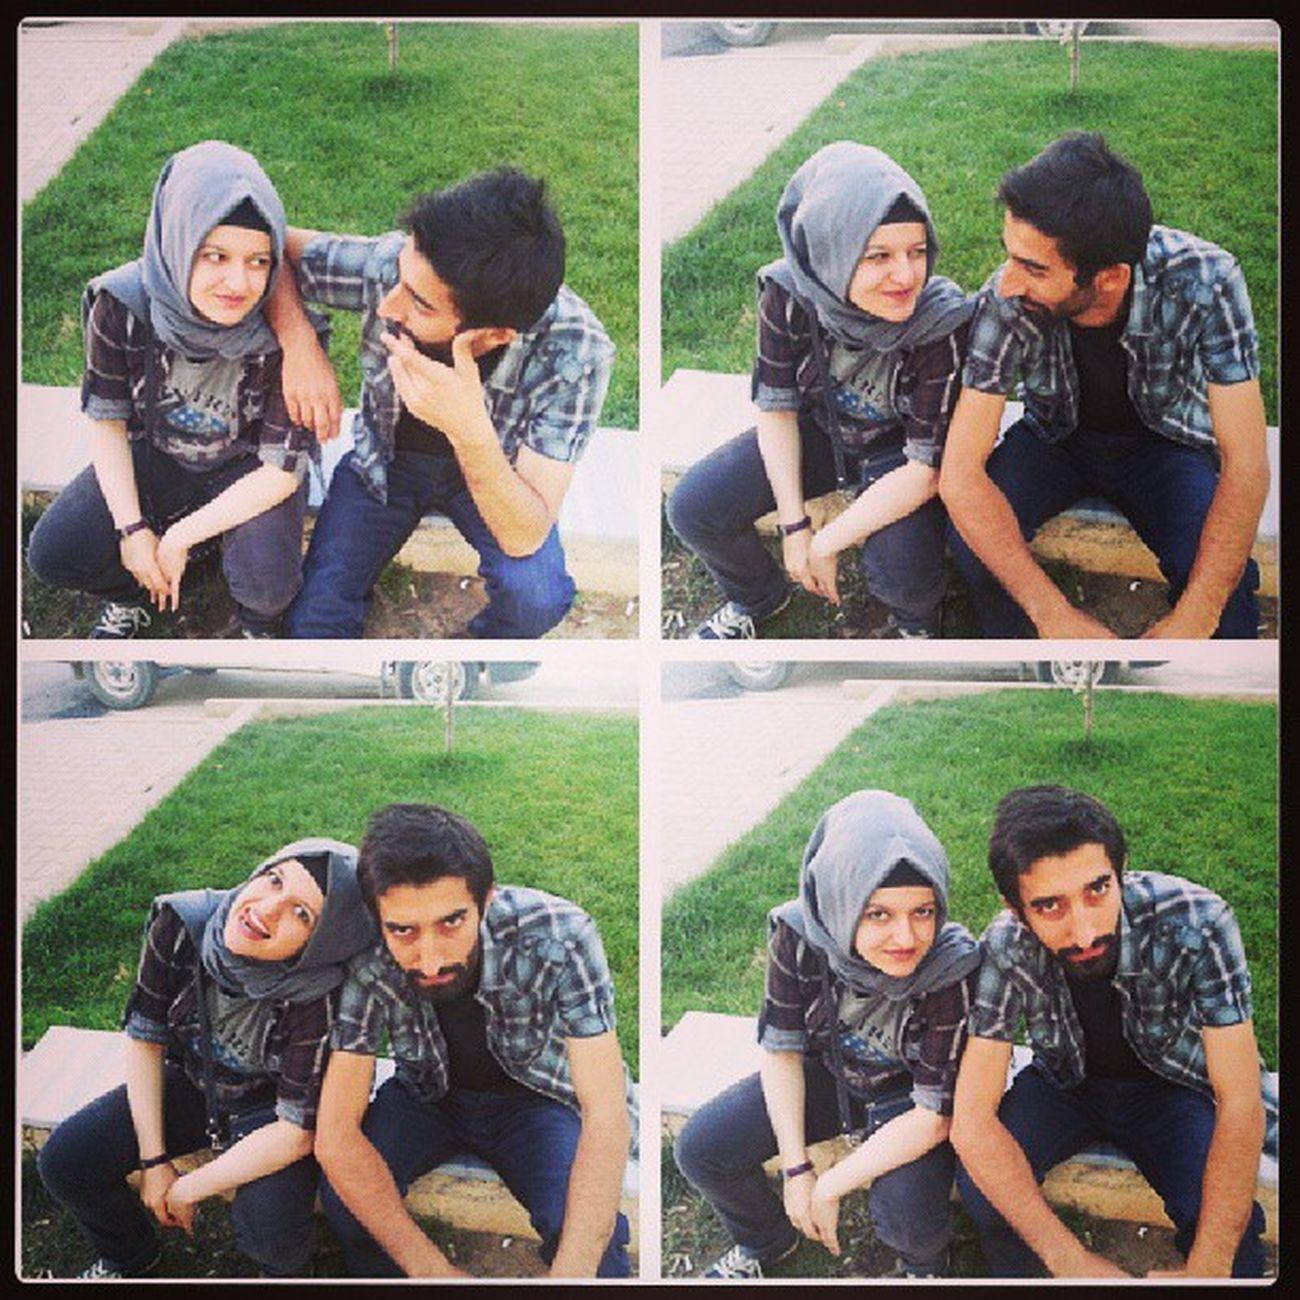 Mus Alparslan University Bestfriend fatih and me kutahya feat trabzon instagood dude